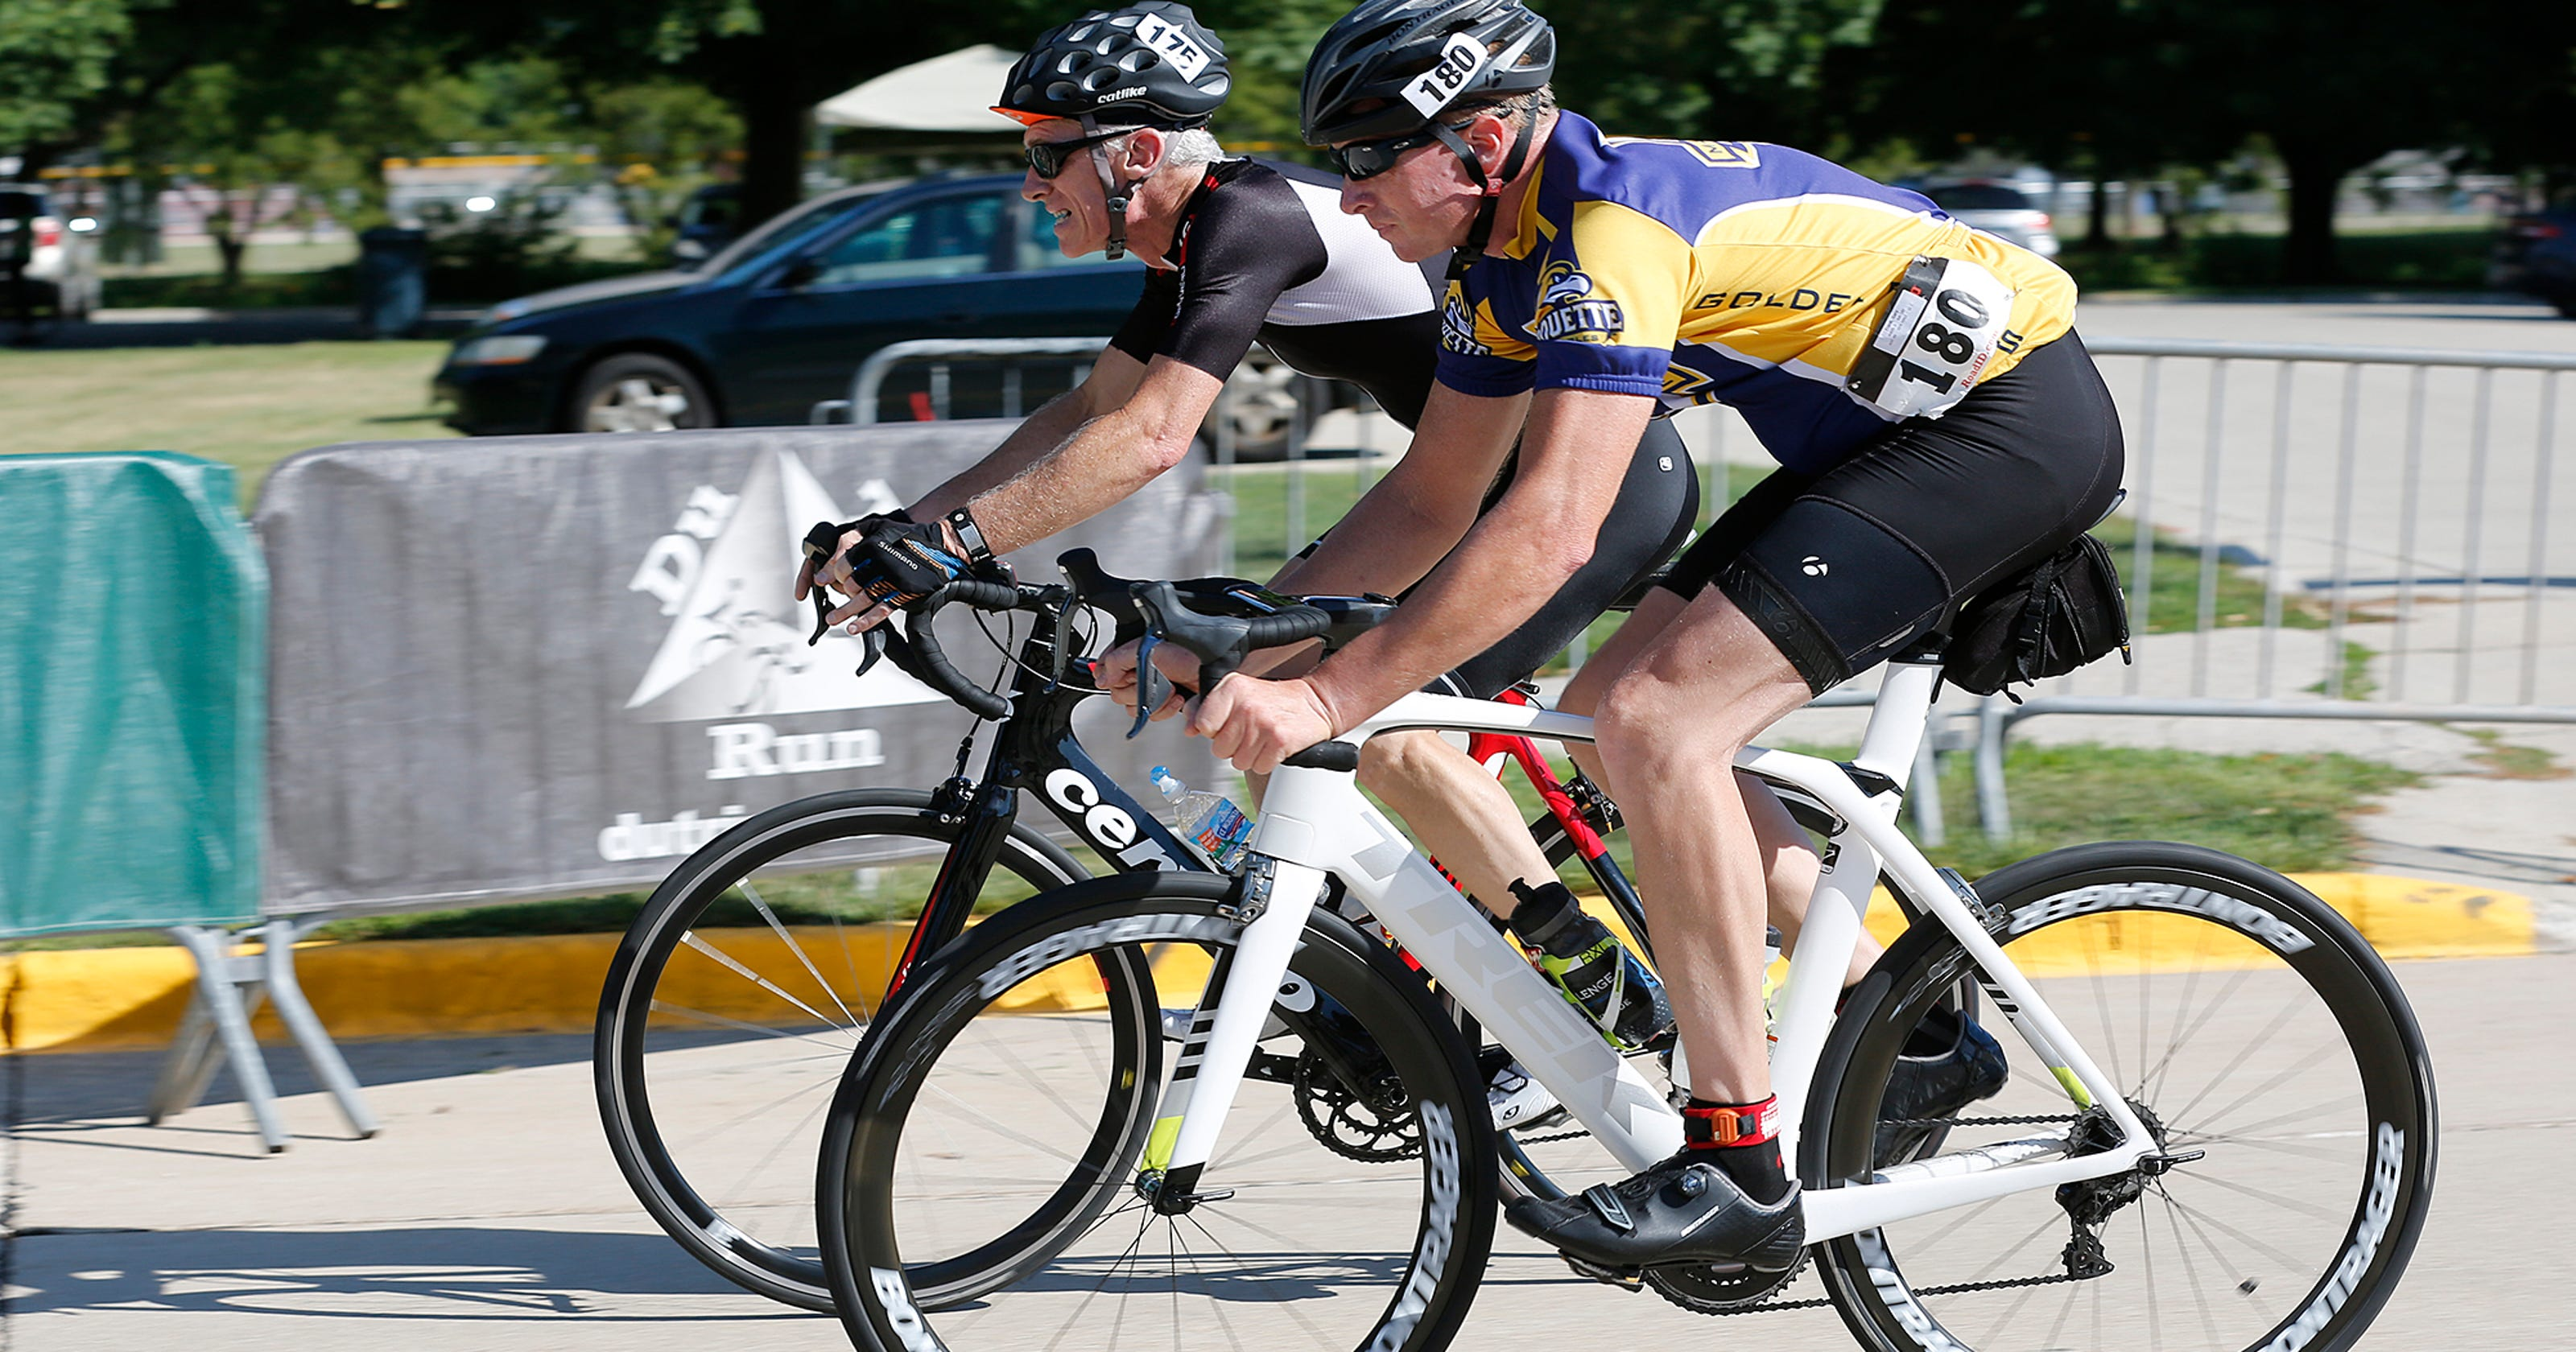 Fond Du Lac Race The Lake Bike Crash Four Injured Taken To Hospital